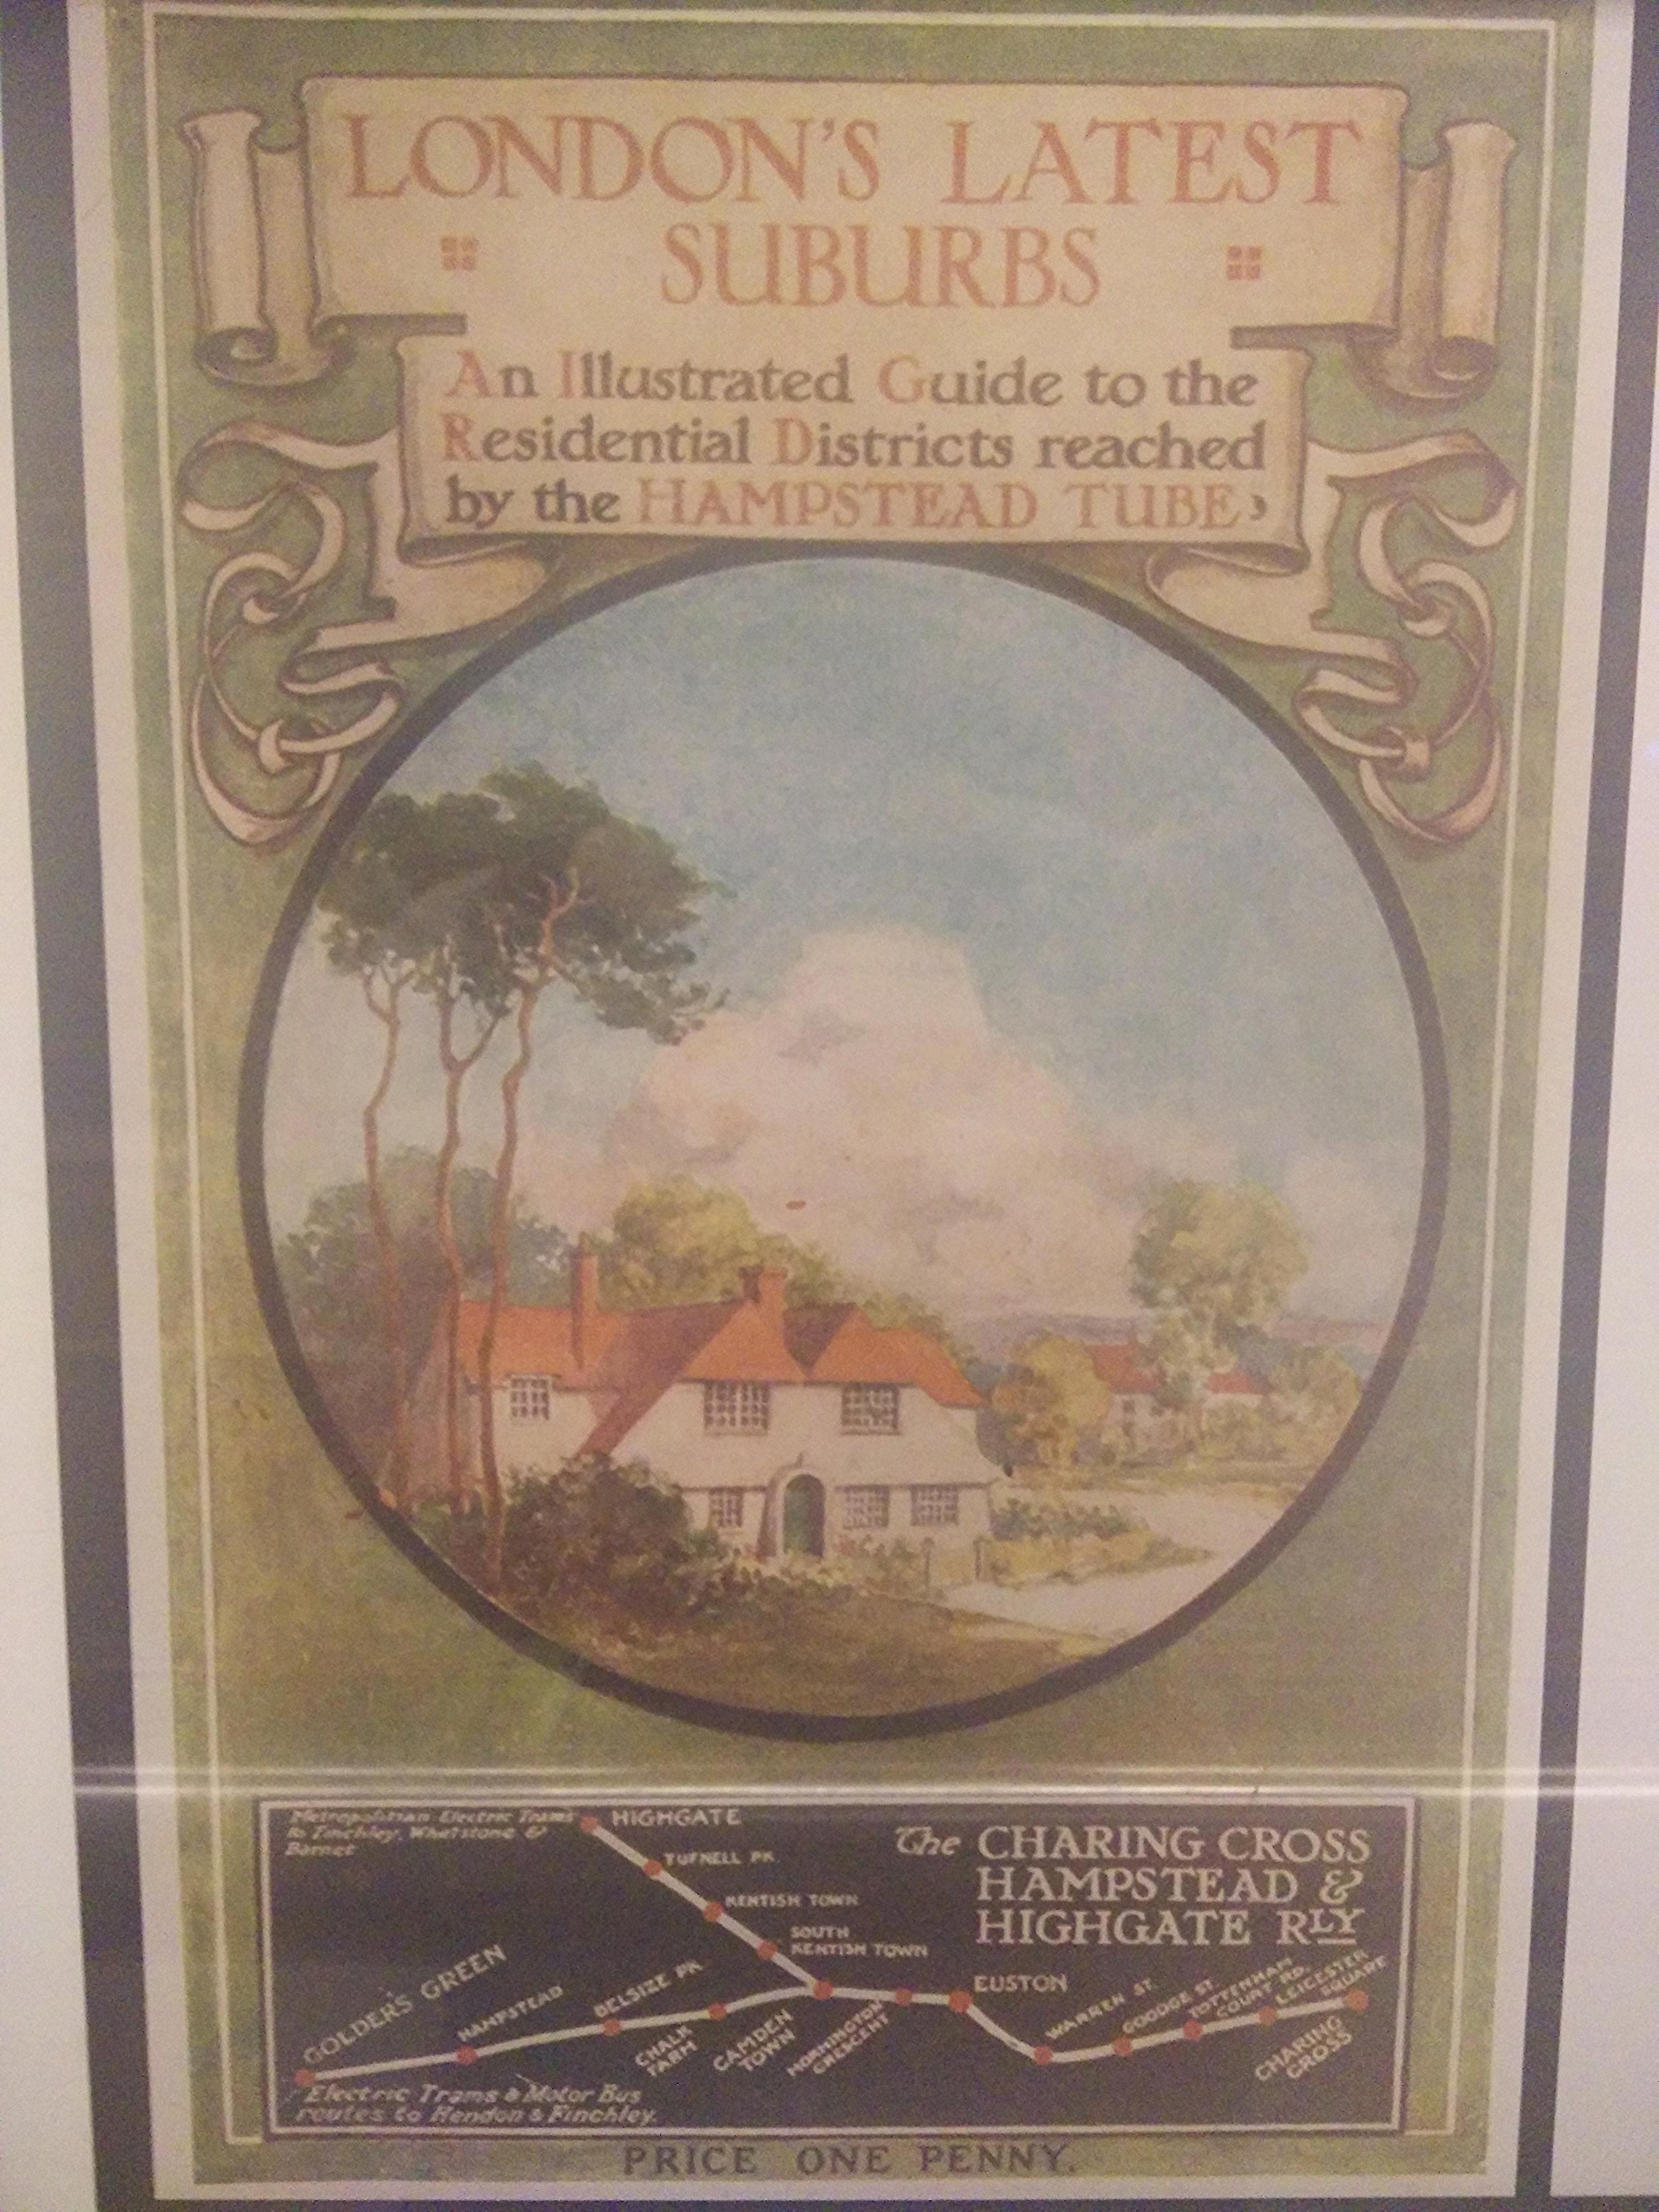 Some Hampstead Tube History